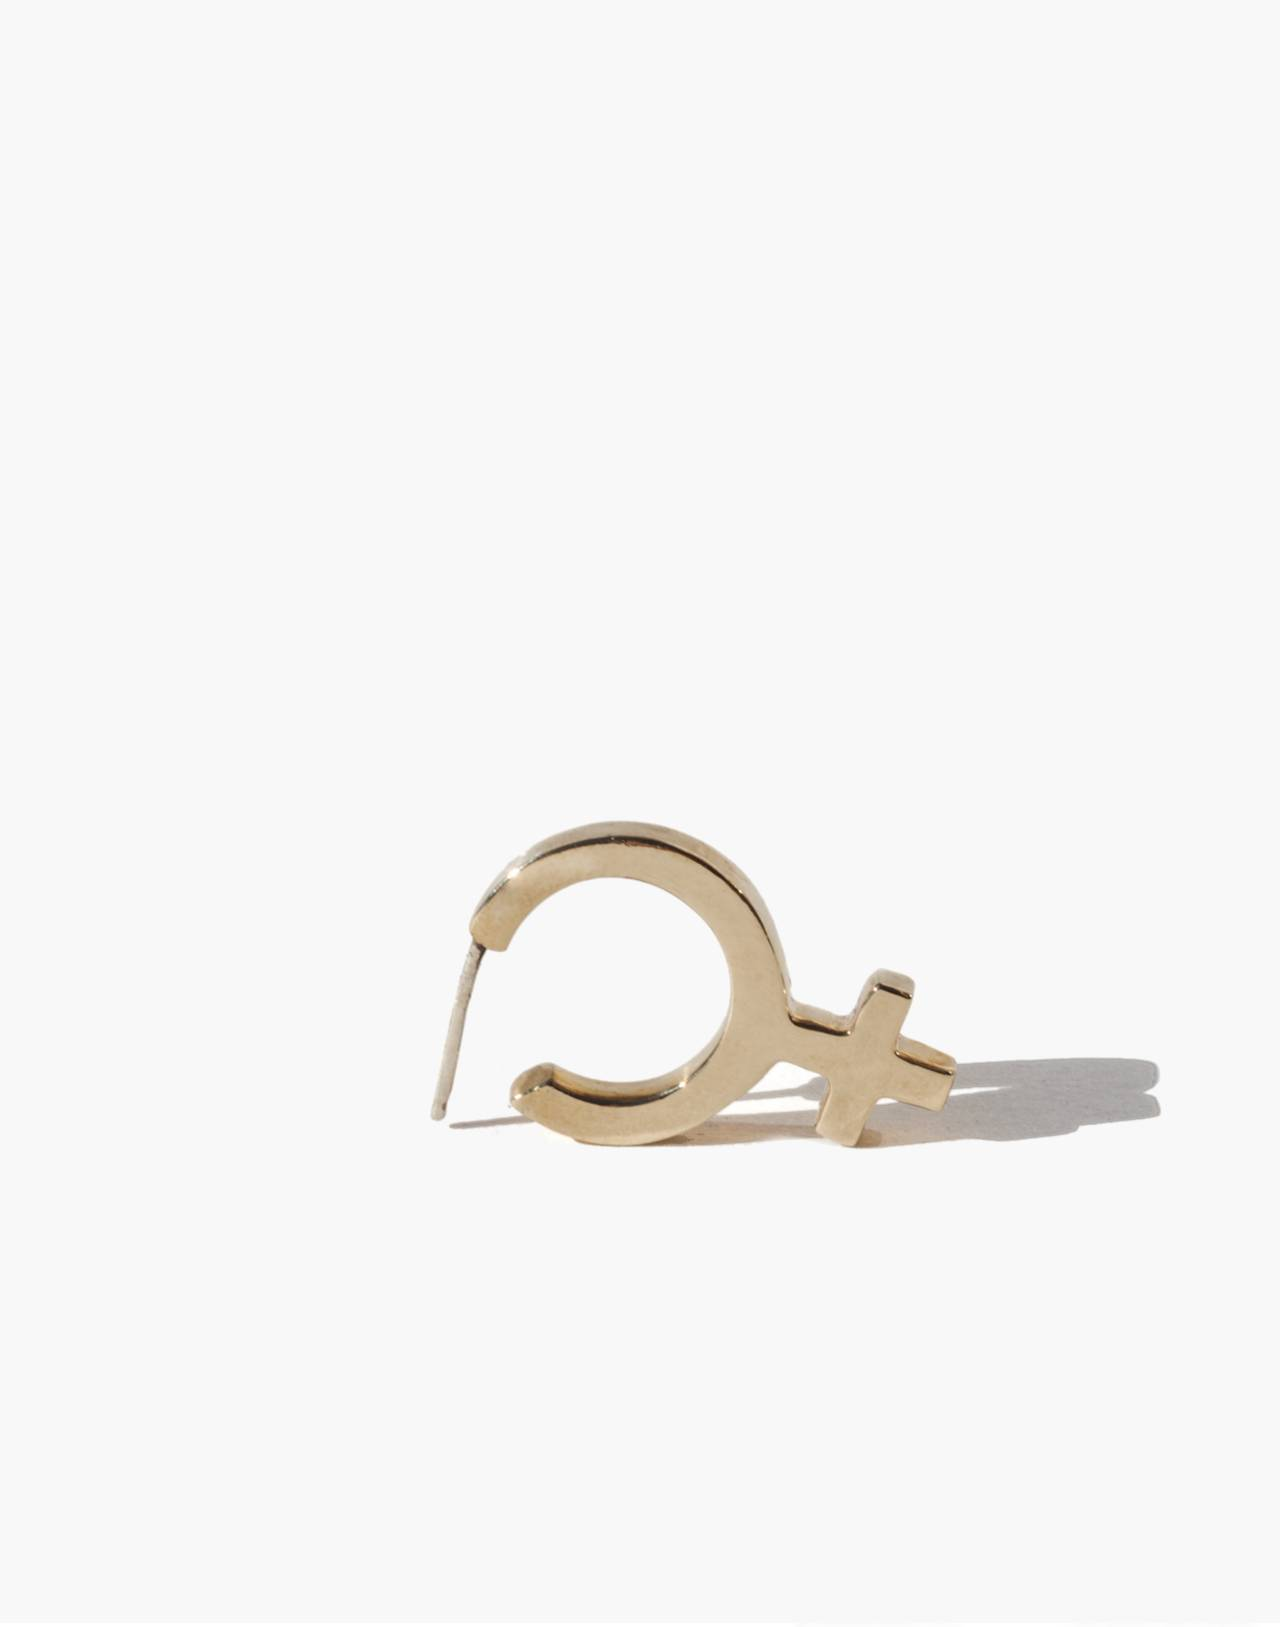 Charlotte Cauwe Studio Brass Female Hoop Earrings in gold image 1